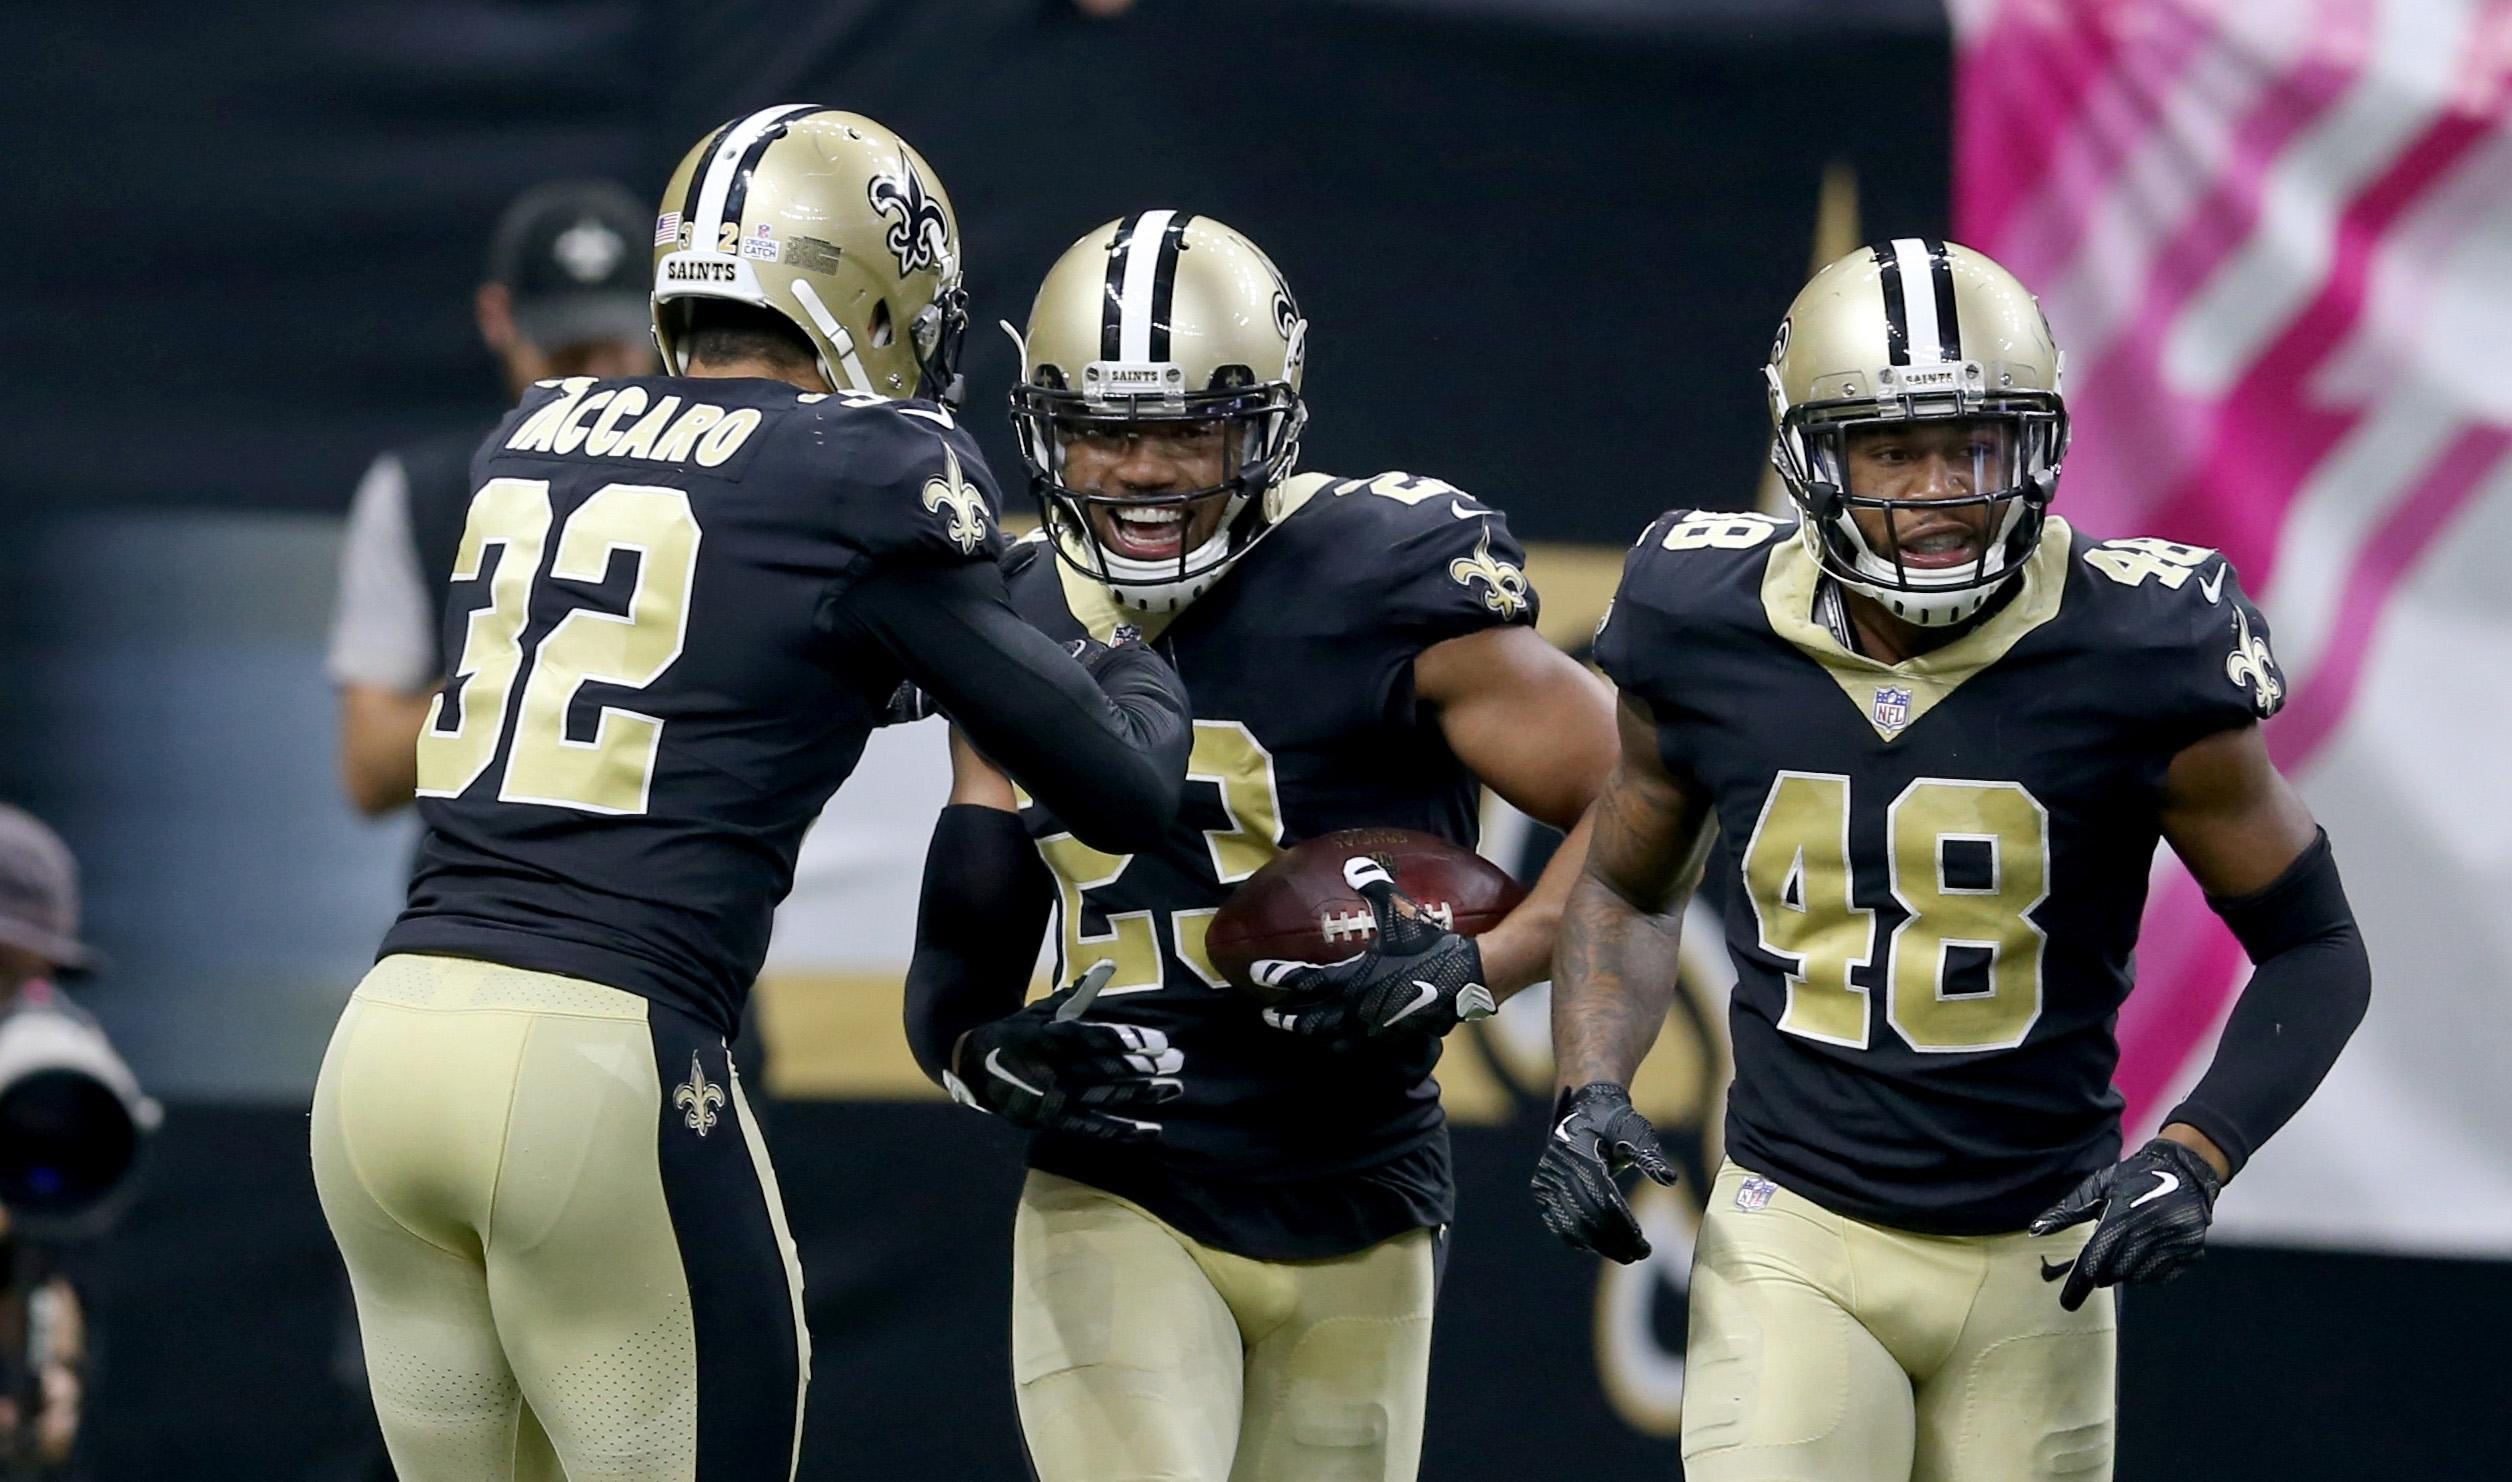 Alvin Kamara Draft Profile >> New Orleans Saints at Green Bay Packers: Bold Predictions - Canal Street Chronicles